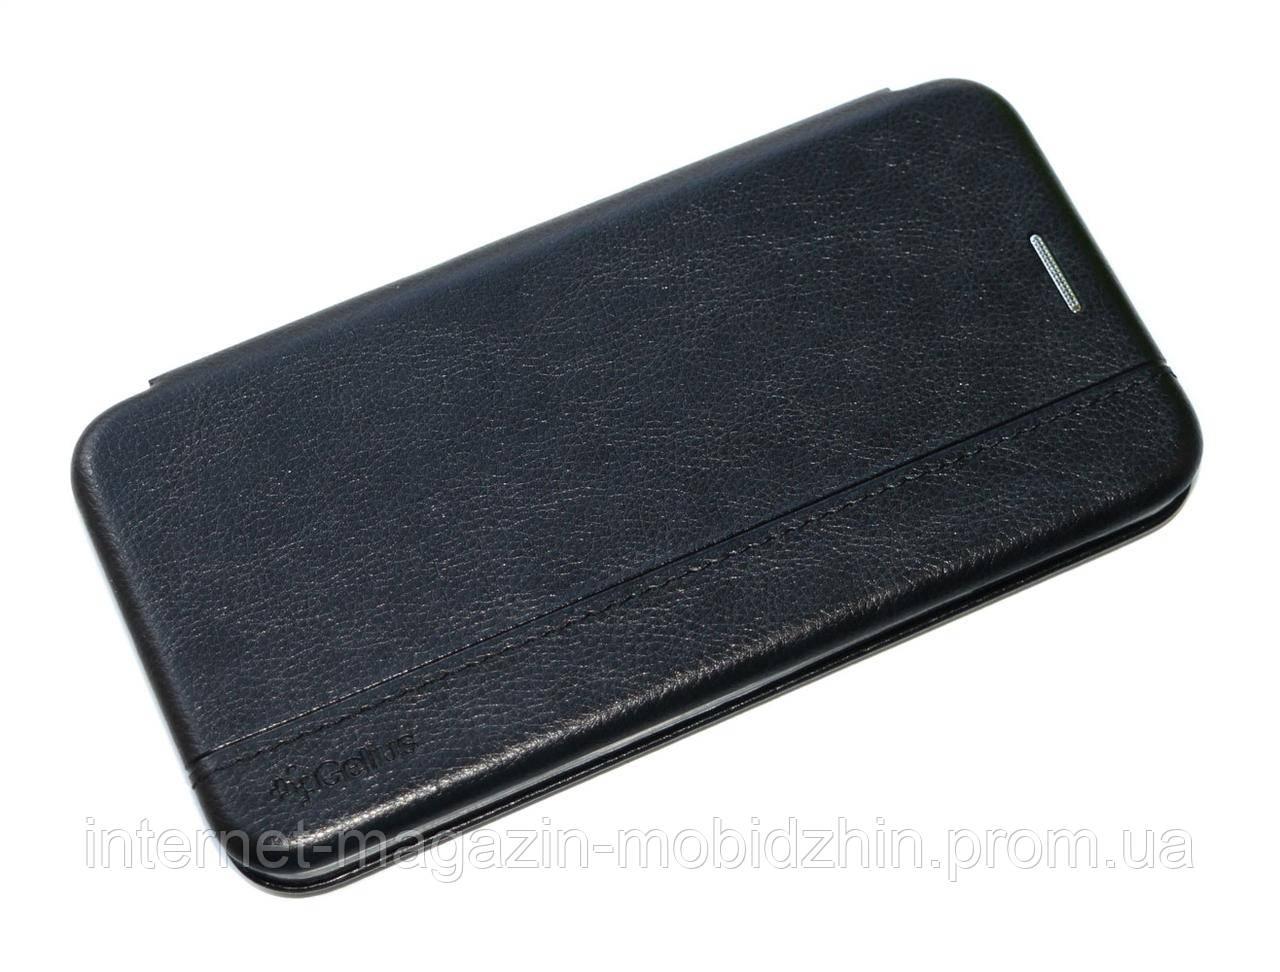 Чехол-книжка Samsung G970 Galaxy S10e черная Gelius Leather